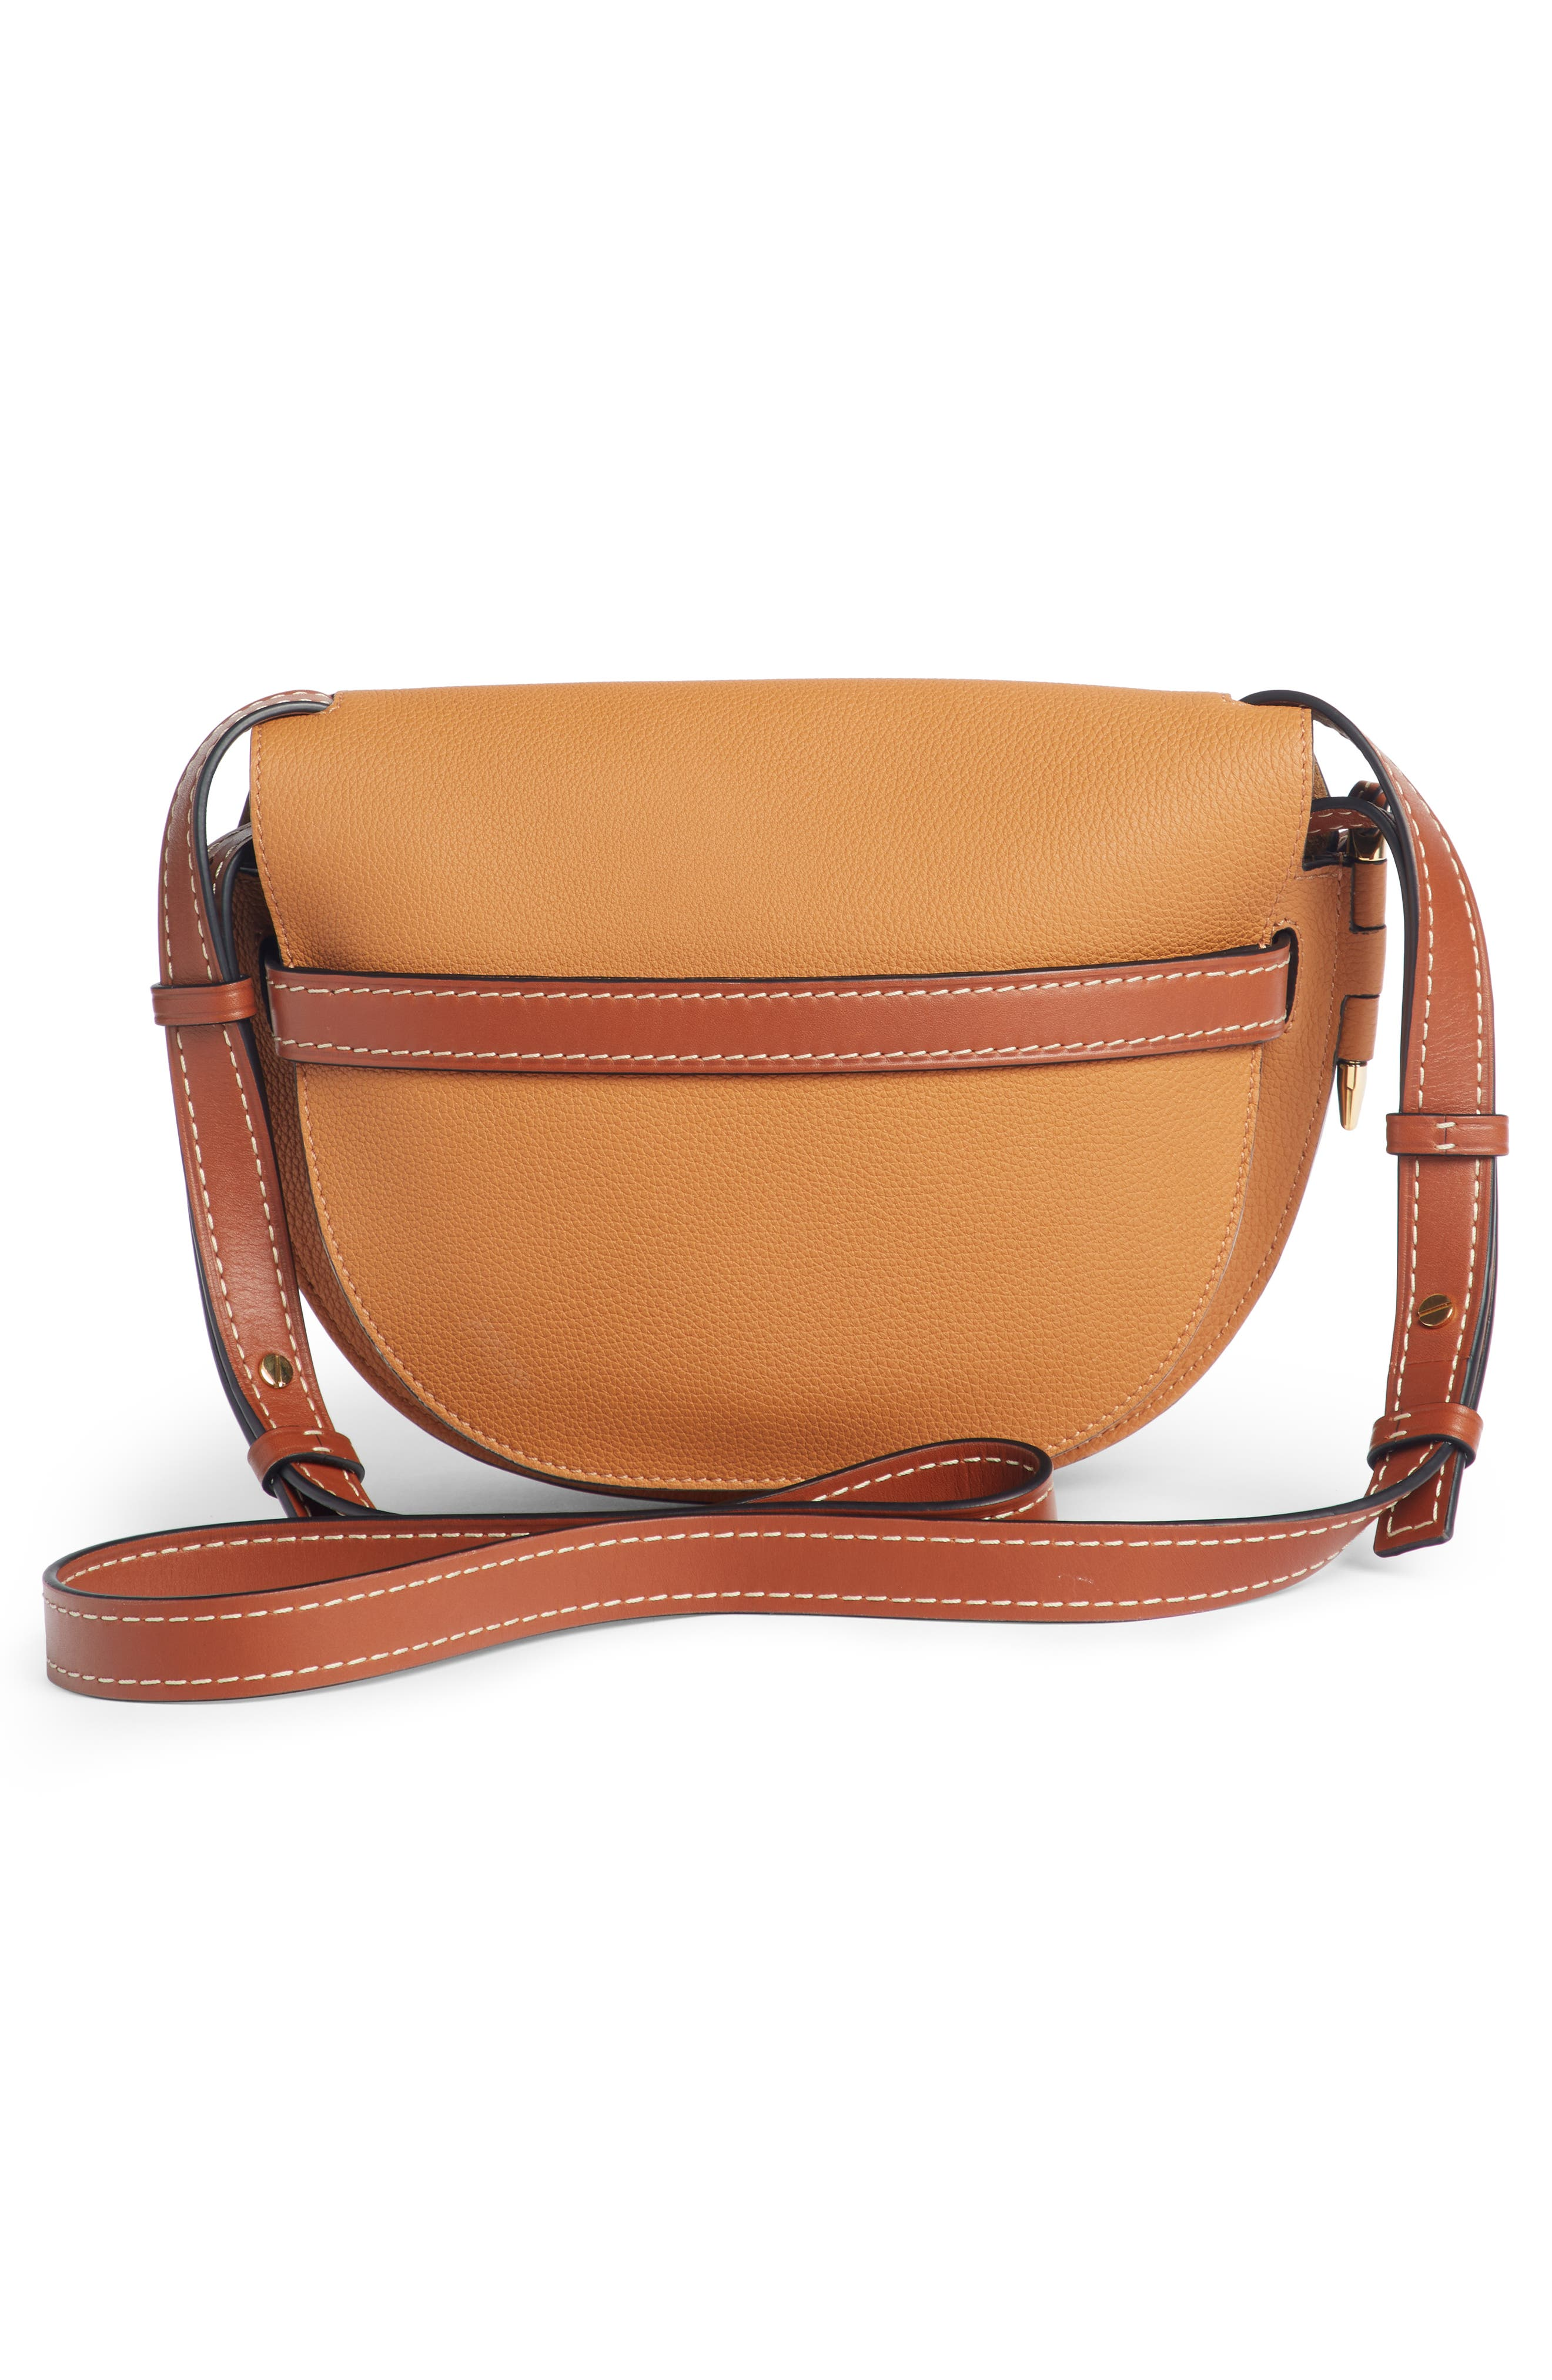 LOEWE,                             Small Gate Leather Crossbody Bag,                             Alternate thumbnail 3, color,                             LIGHT CARAMEL/ PECAN